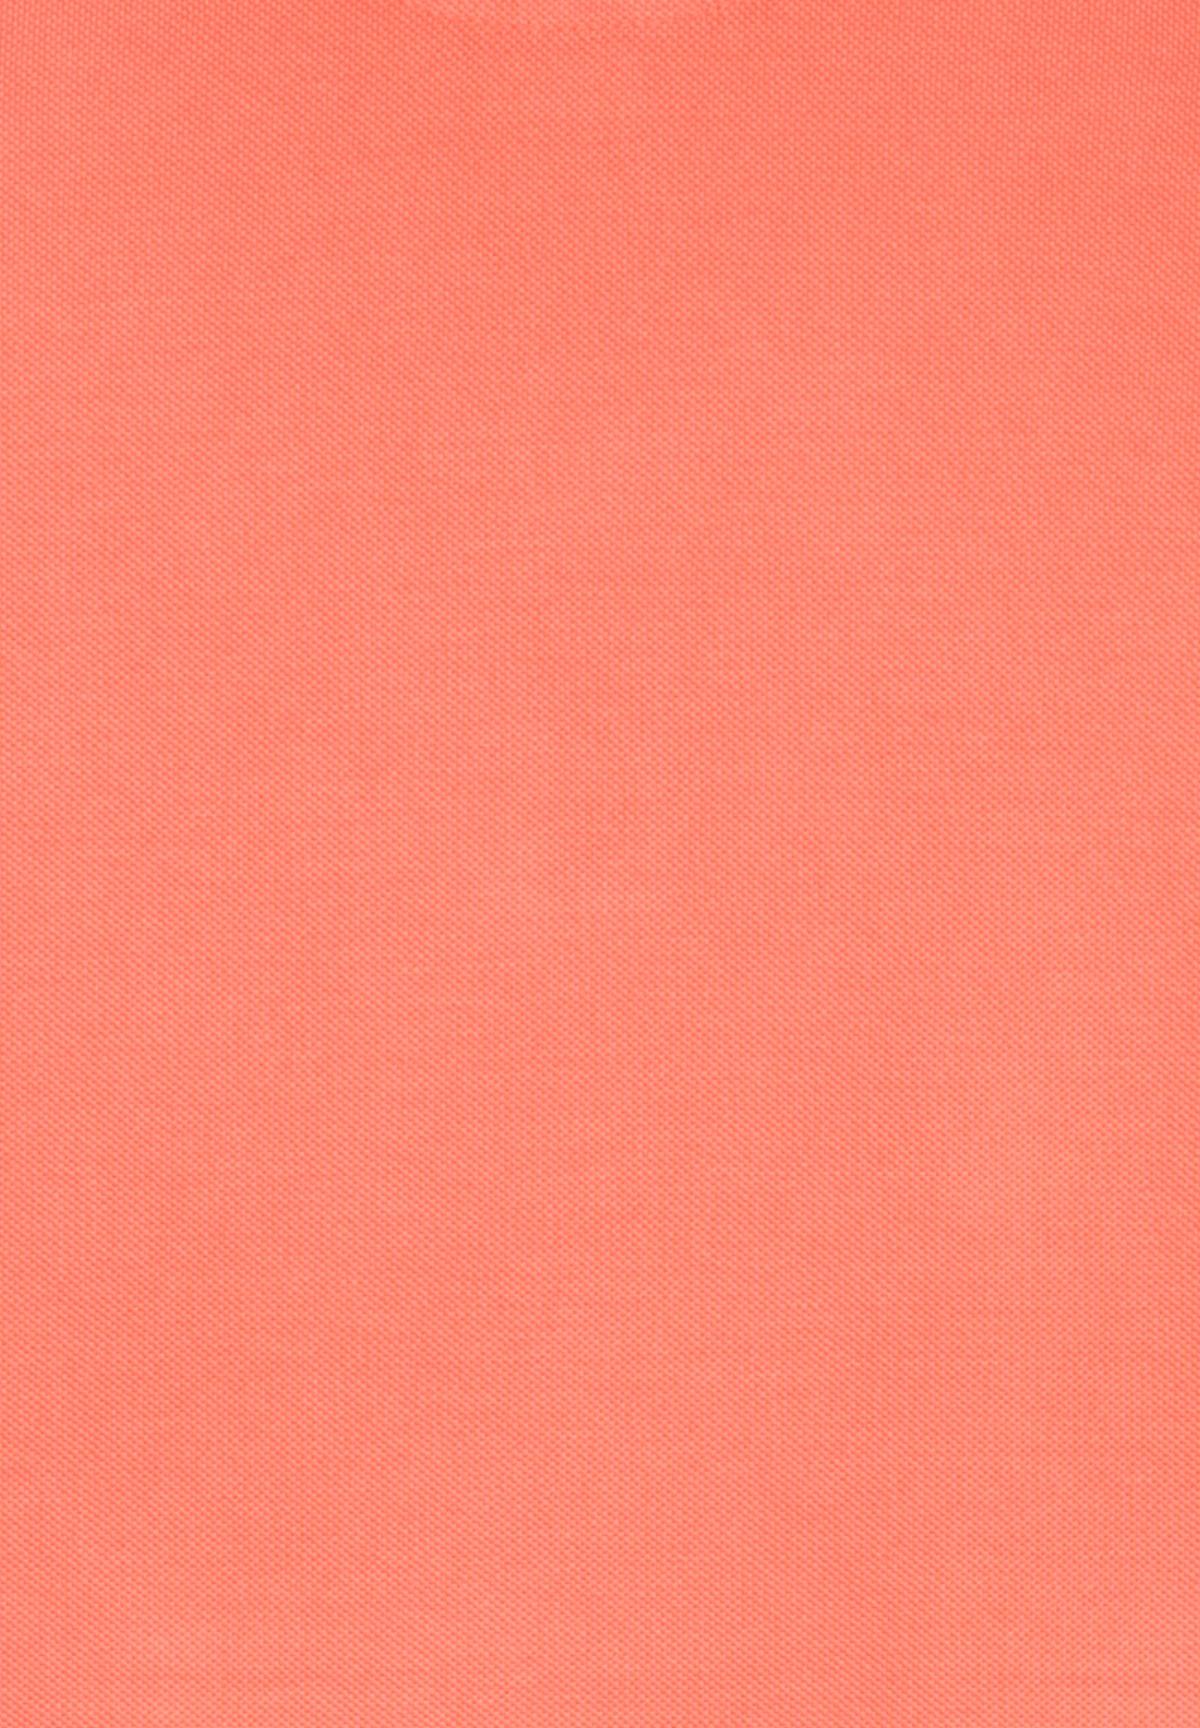 Camel-Active-Herren-Shirt-Poloshirt-Pique-Regular-Fit-NEU Indexbild 66